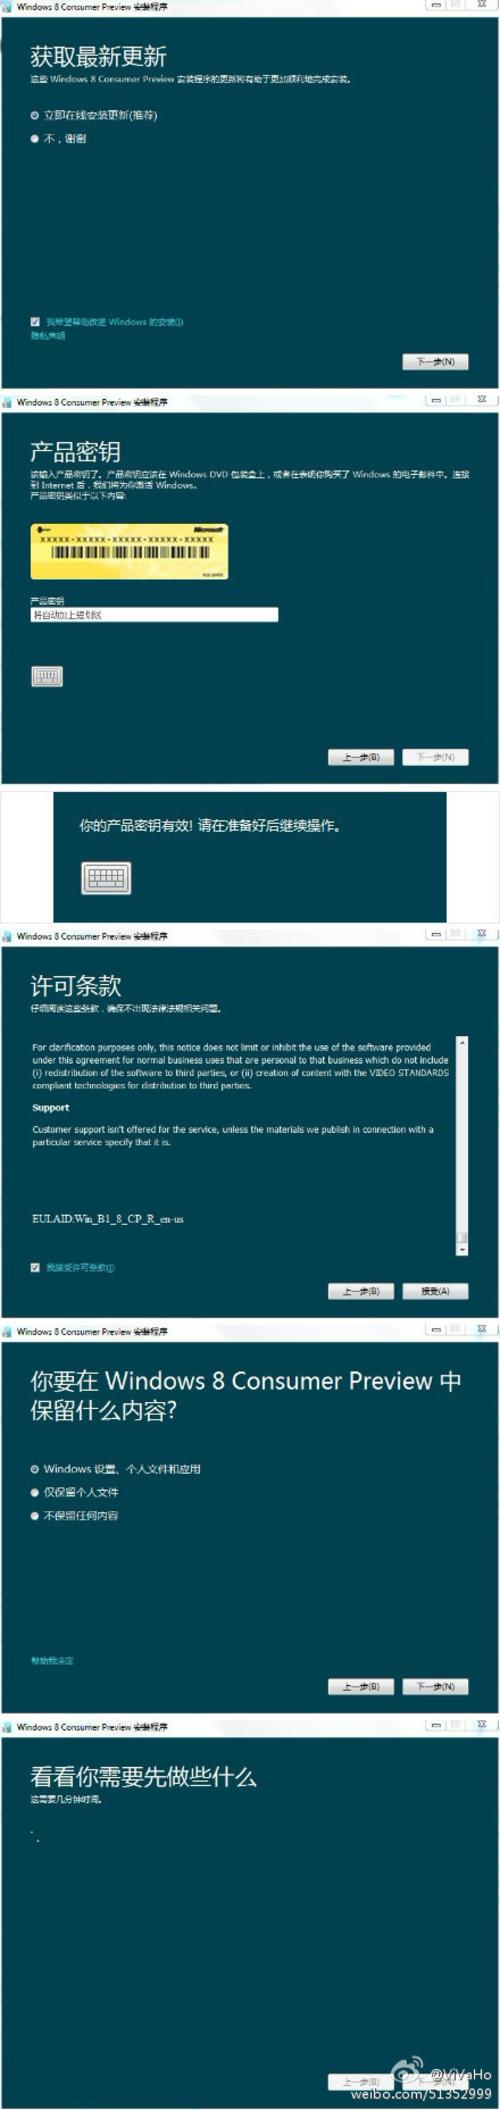 Windows8消費者預覽版簡體中文截圖曝光